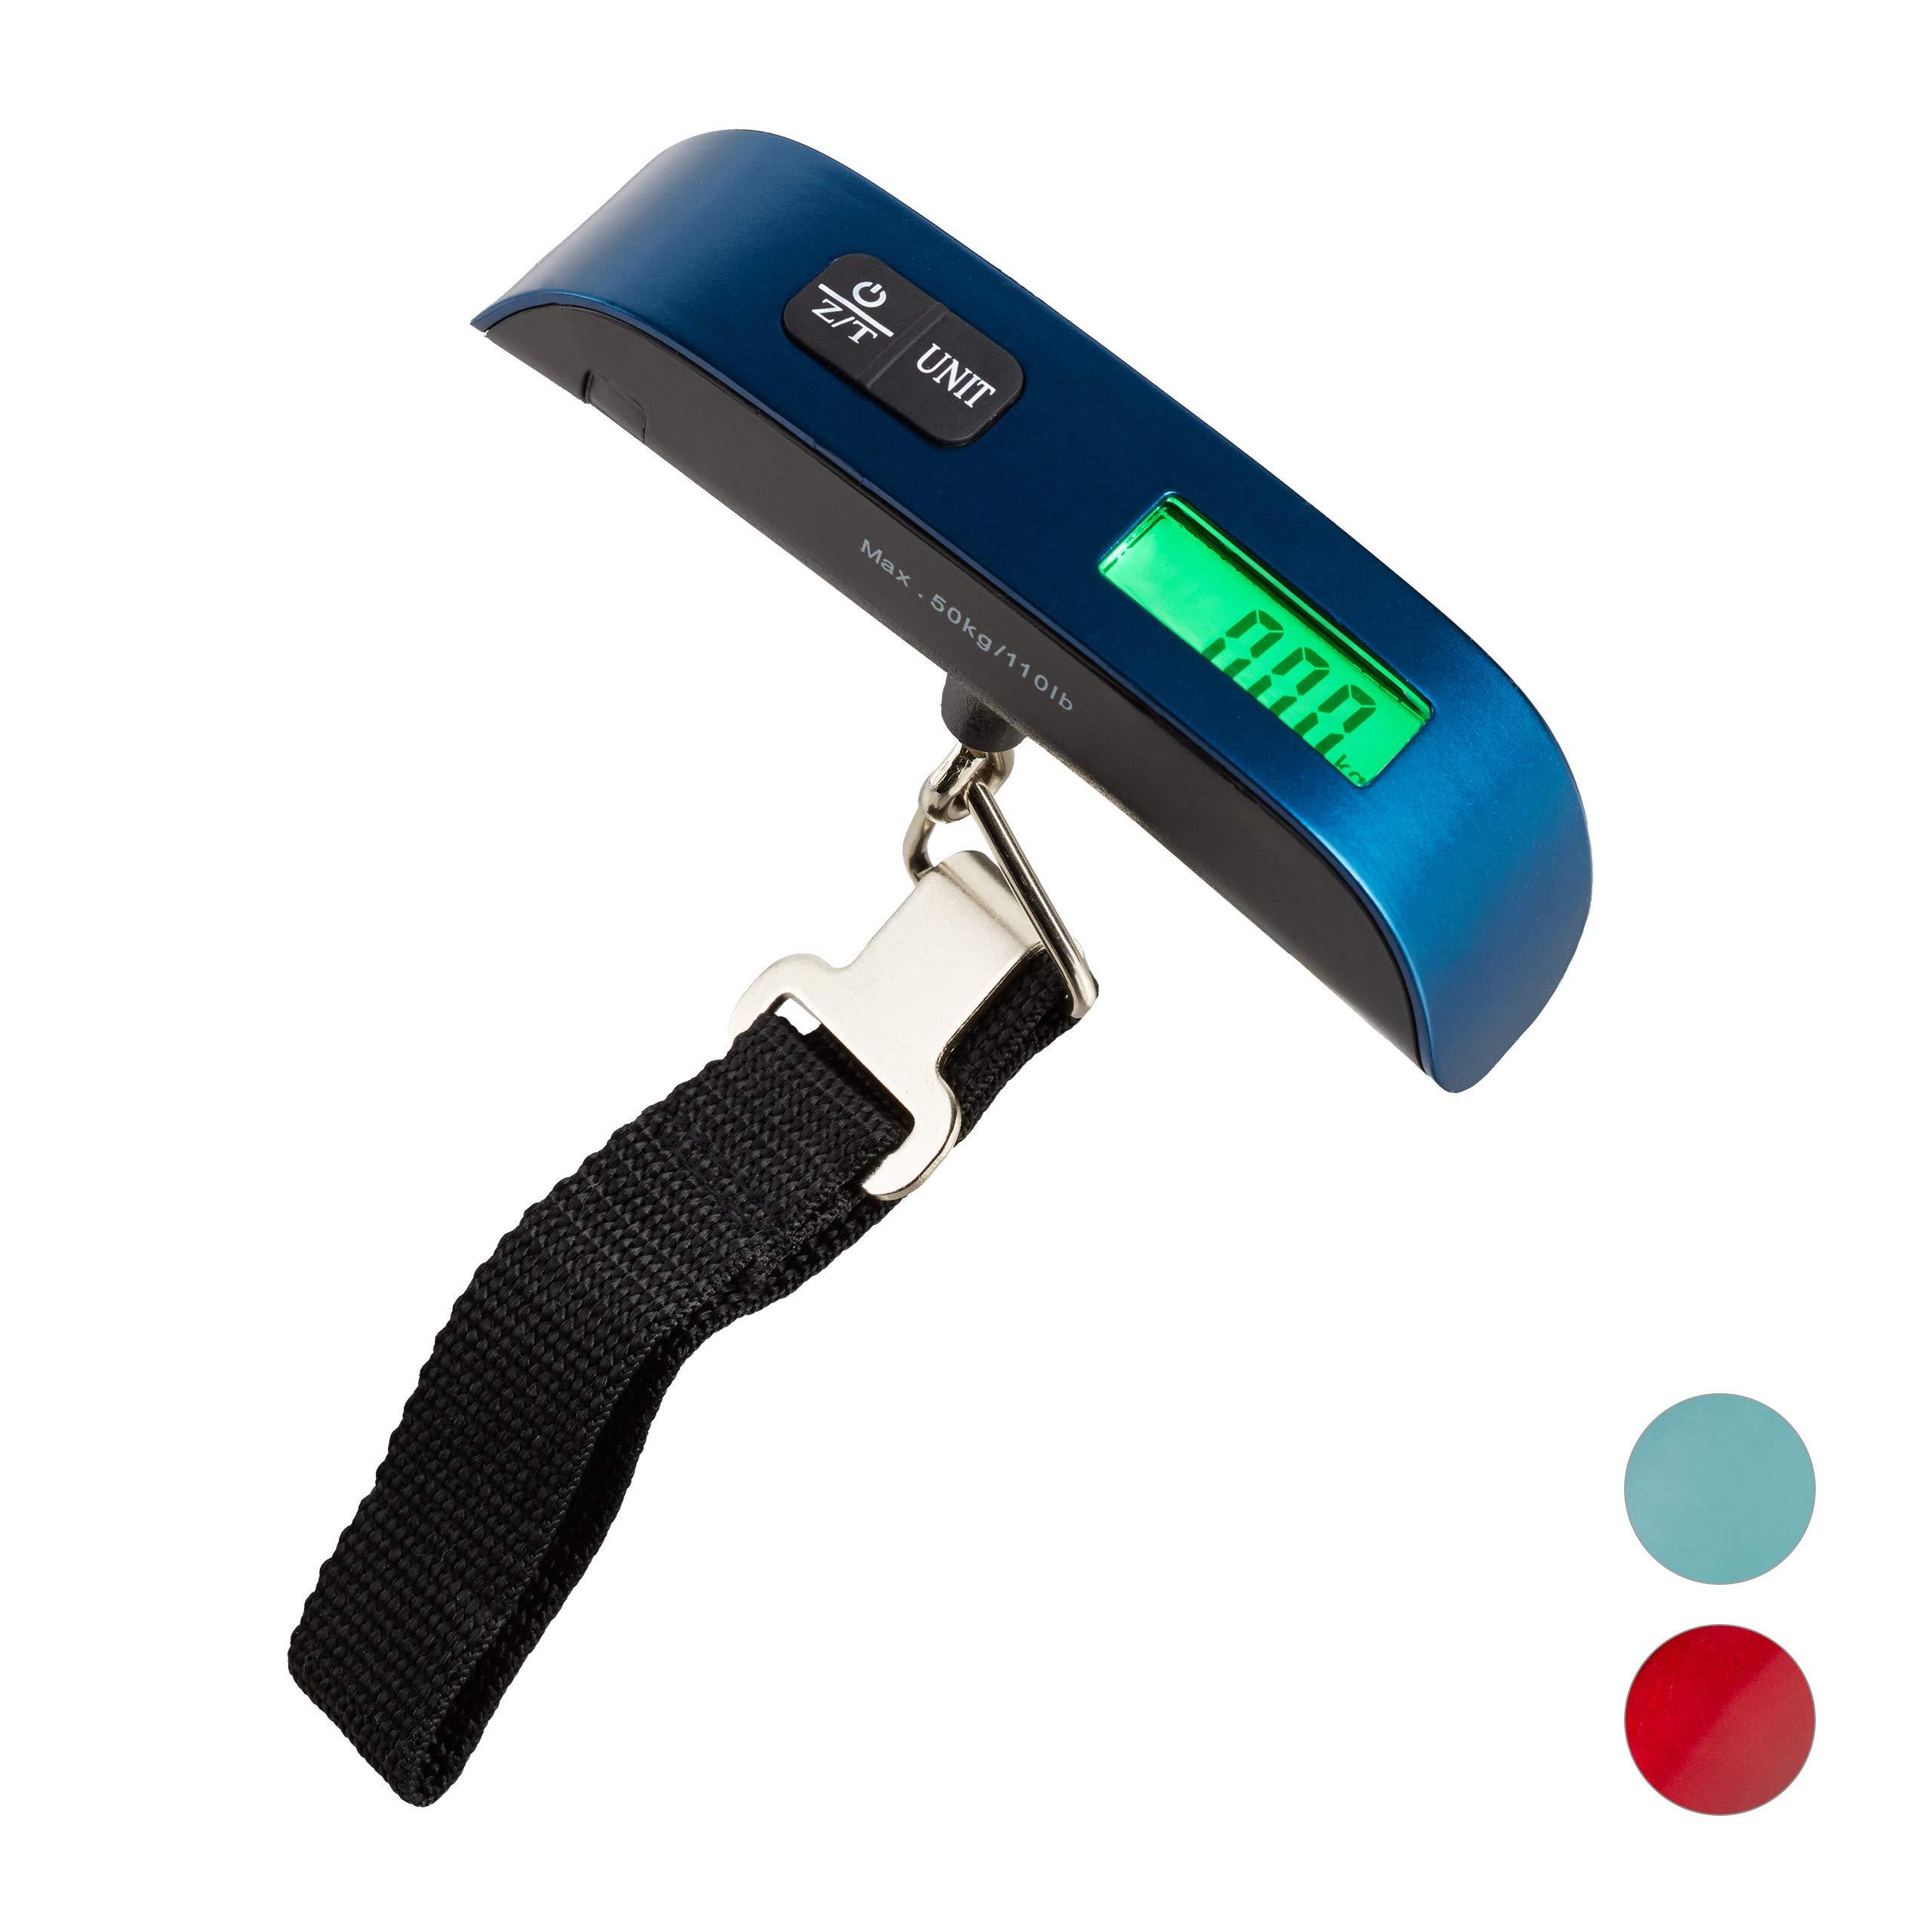 Relaxdays 数字行李秤,50 千克,带挂钩,温度显示和皮*功能,手提箱秤 蓝色 HxWxD app. 19 x 13 x 3 cm 10023620_45